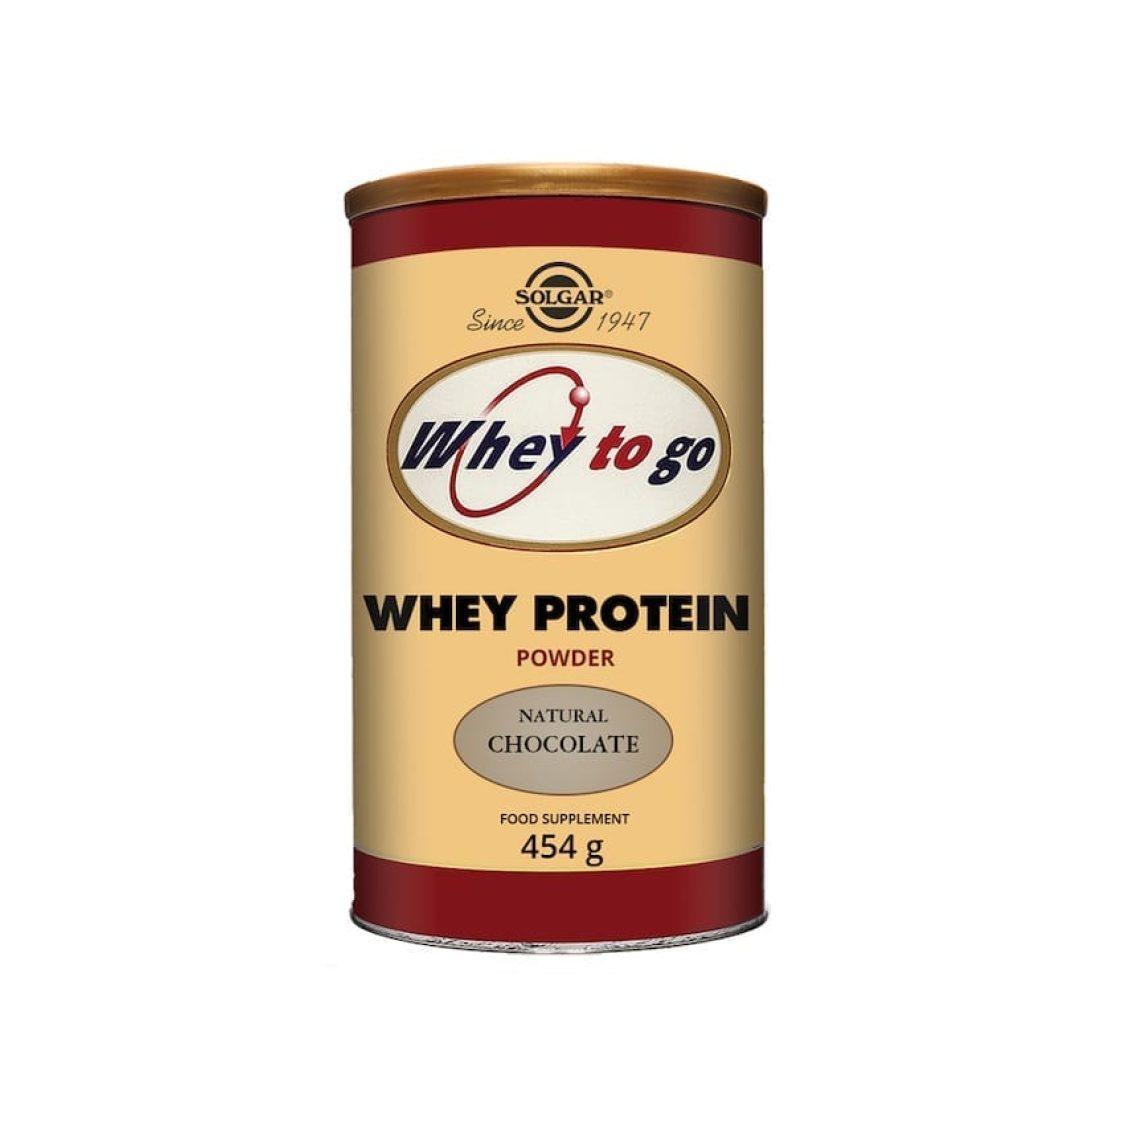 Solgar - Protein - Whey to Go Protein Powder (Van) - Size: 340g